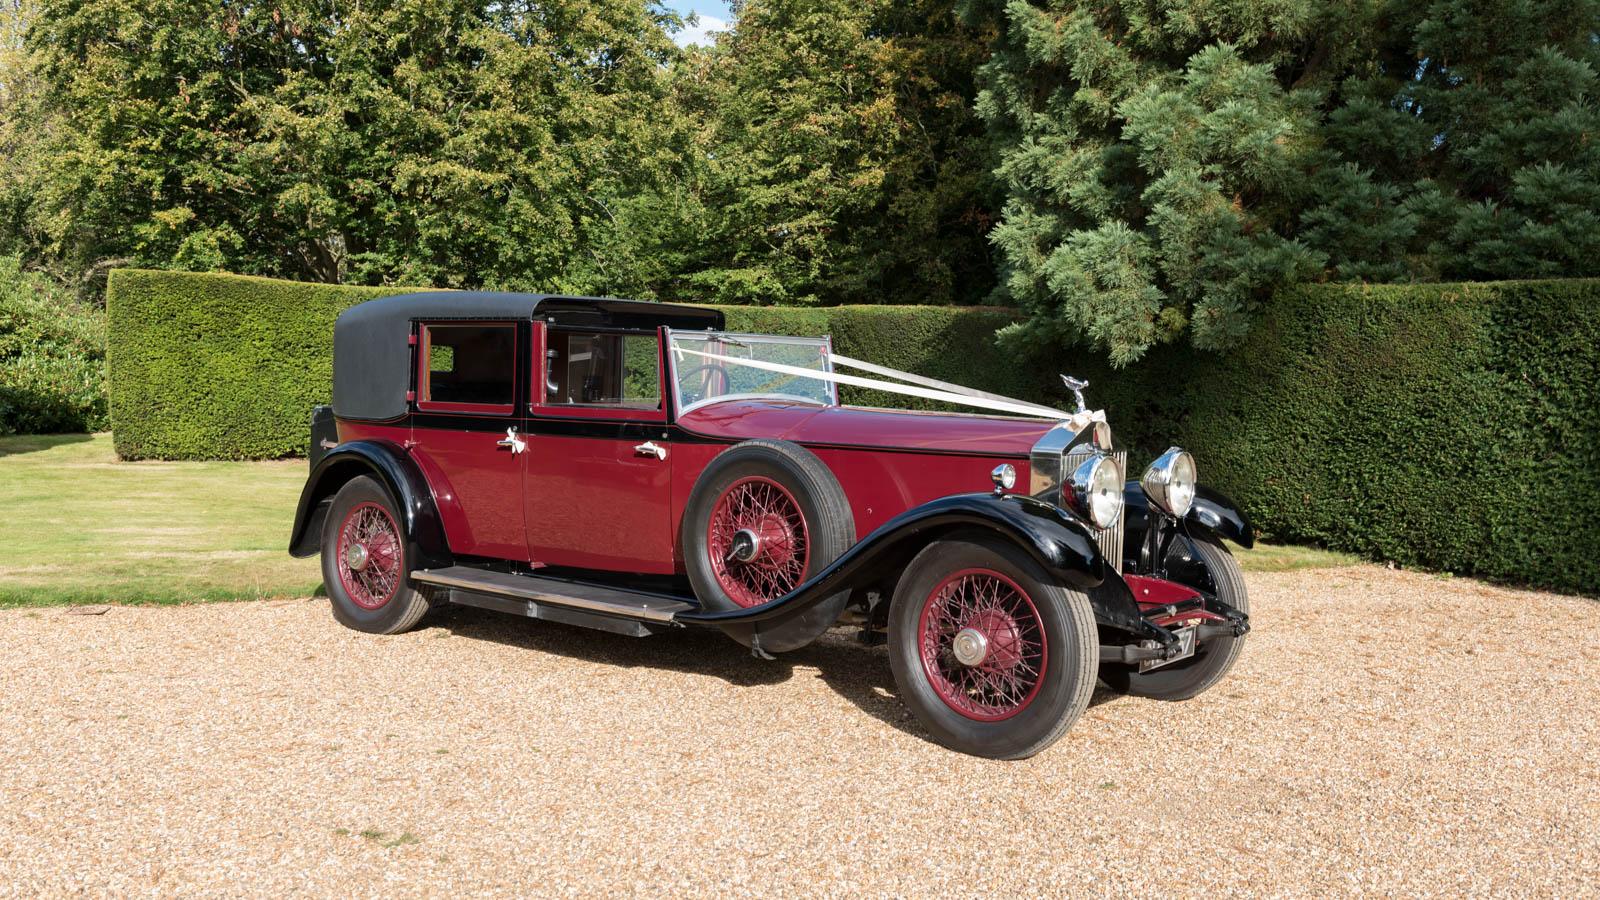 vintage wedding cars kent classic car hire distinctly. Black Bedroom Furniture Sets. Home Design Ideas